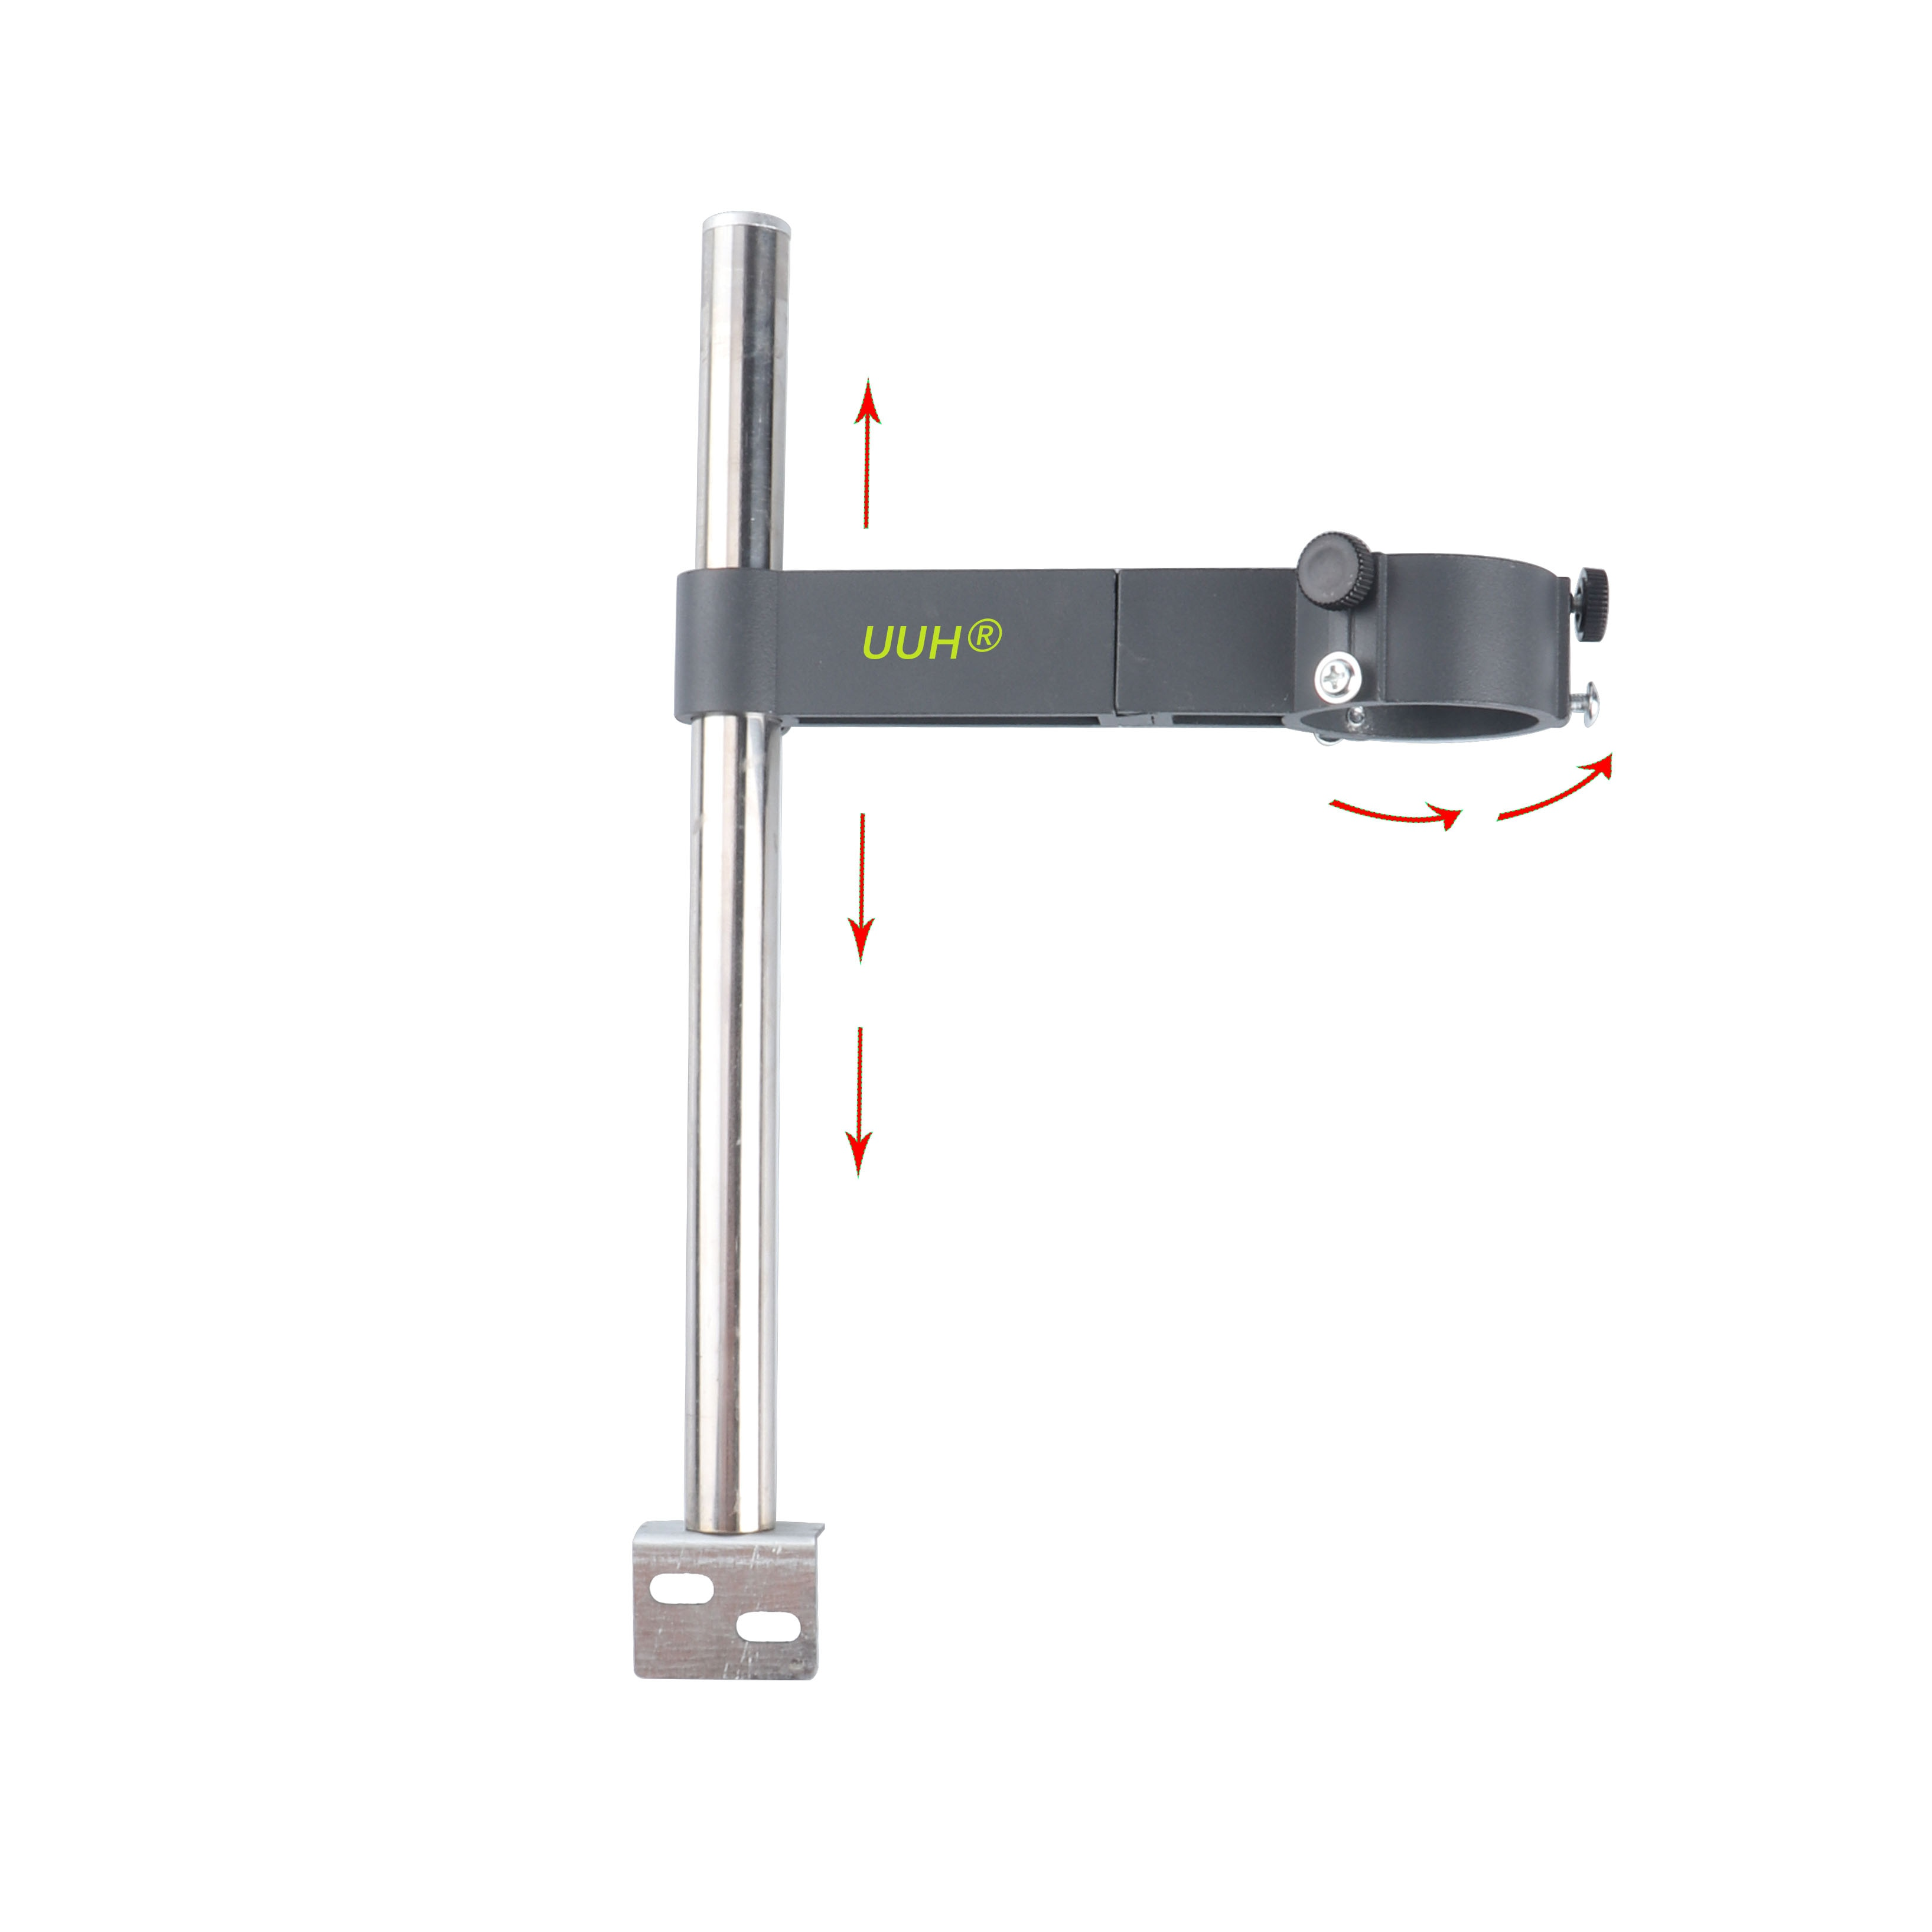 UUH Soldering station air gun bracket universal 360 degree universal bracket for 8586 858 909d 8786D